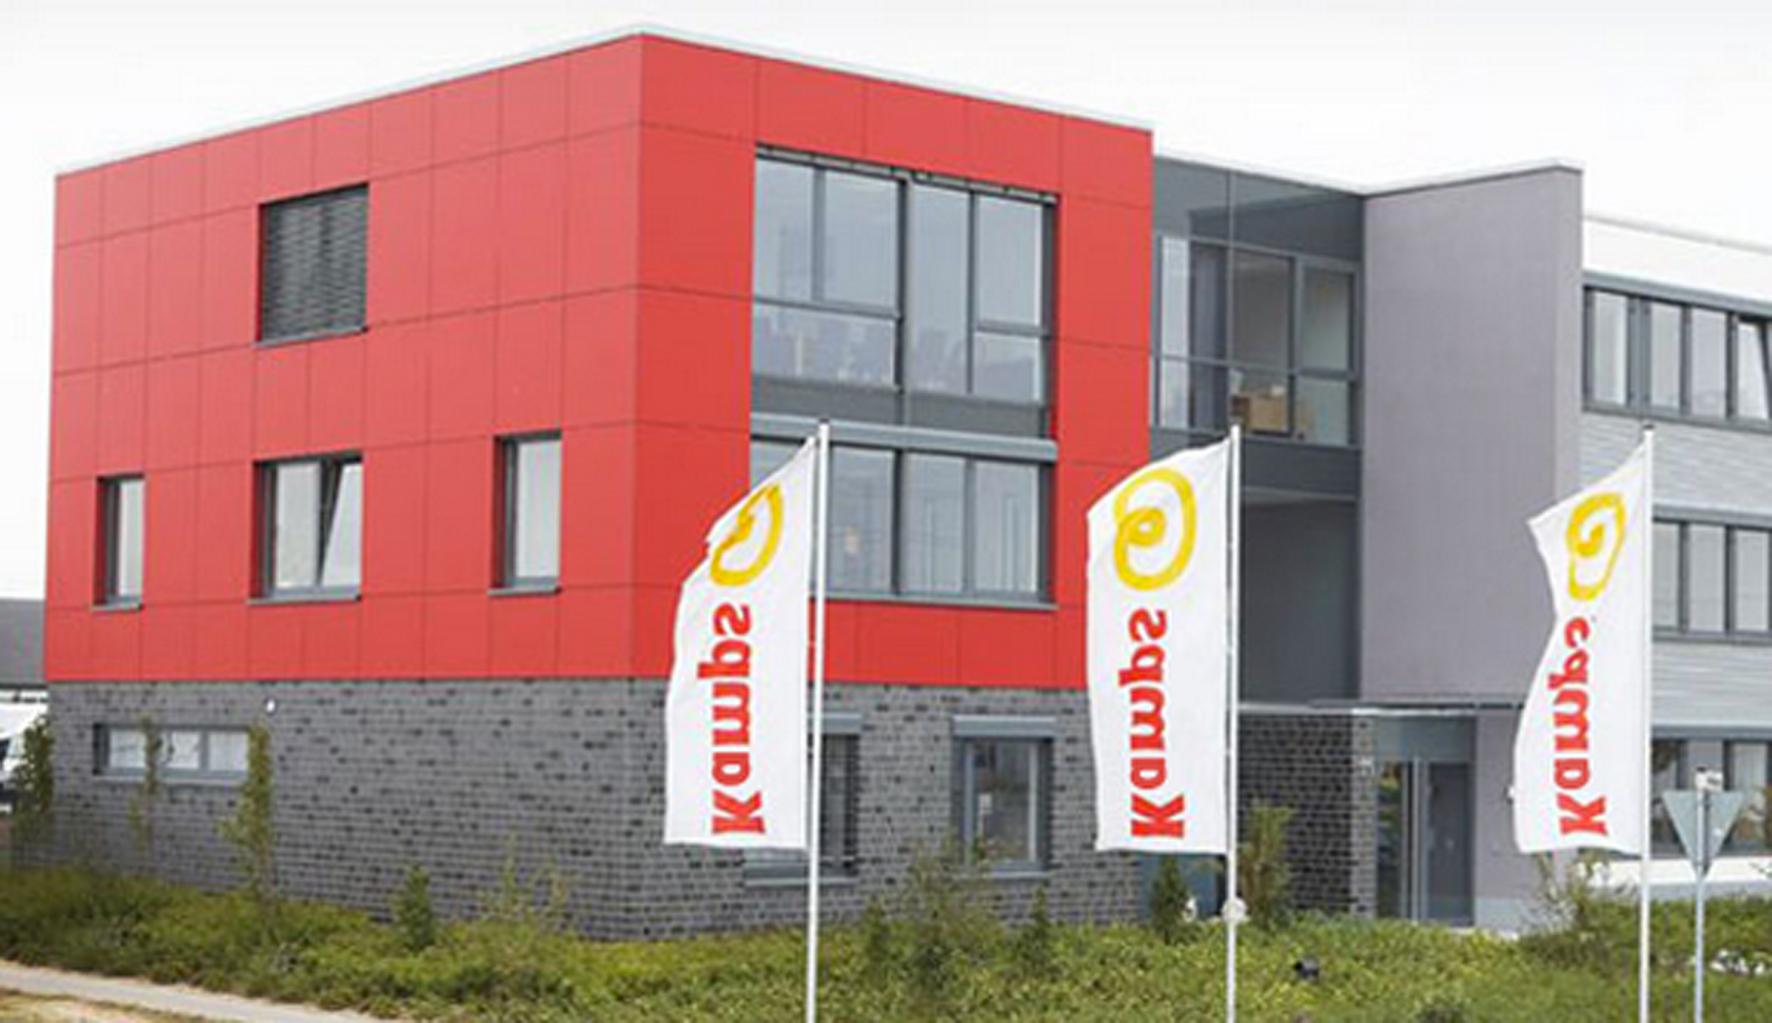 Neubau in Erkelenz